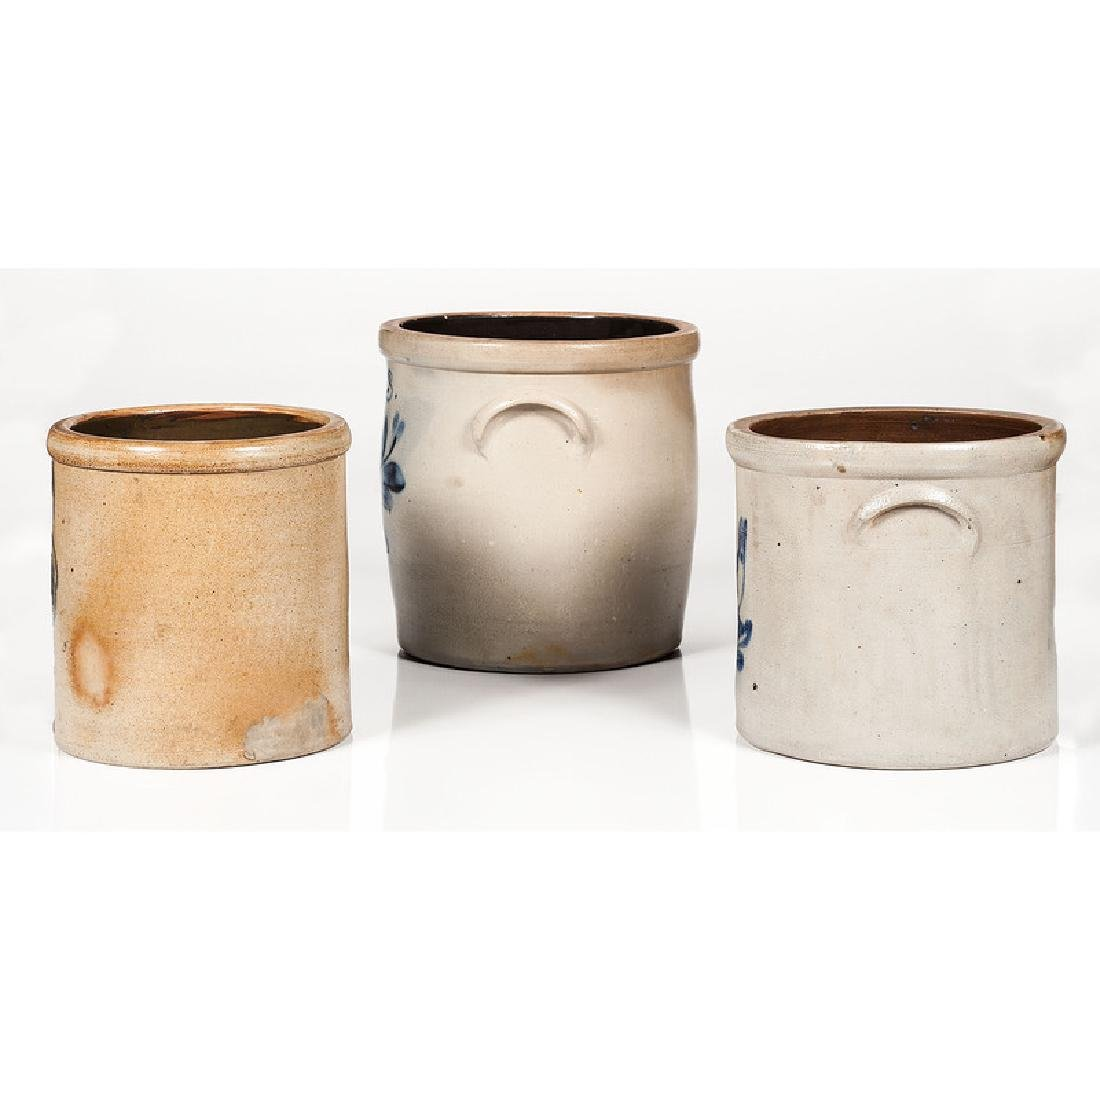 Cobalt Decorated Stoneware Crocks, Including J. Fisher - 4